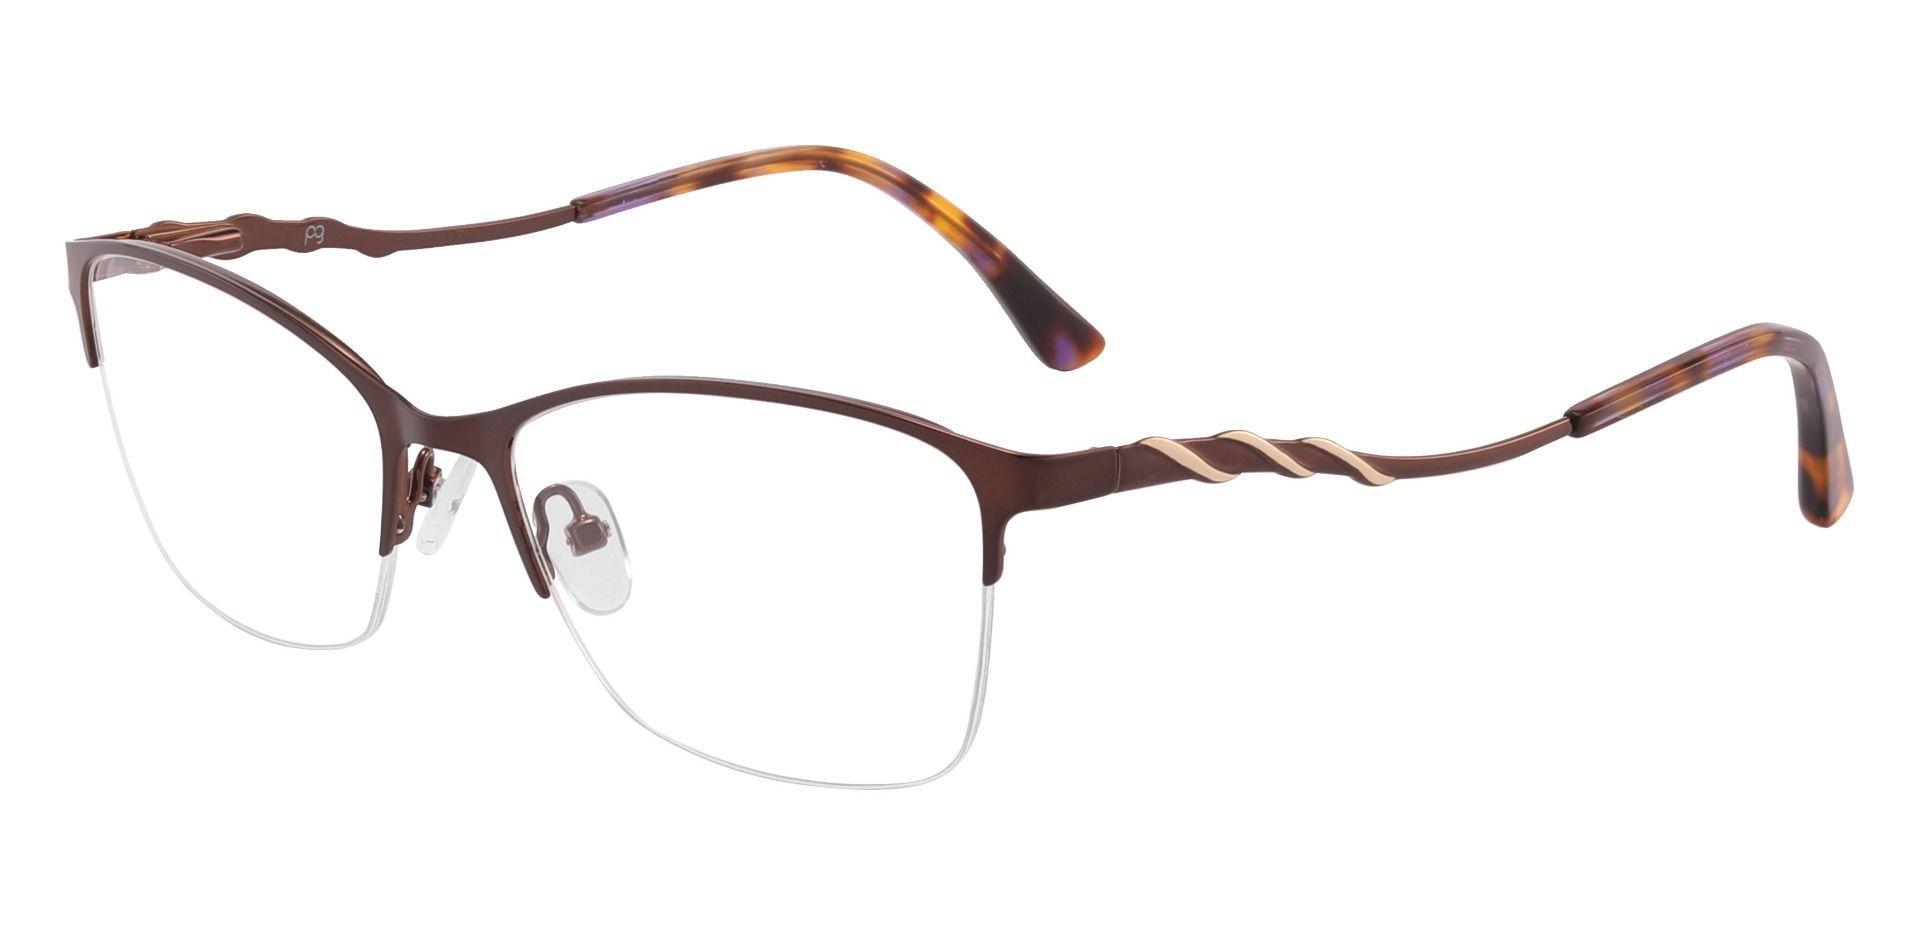 Milan Browline Prescription Glasses - Brown